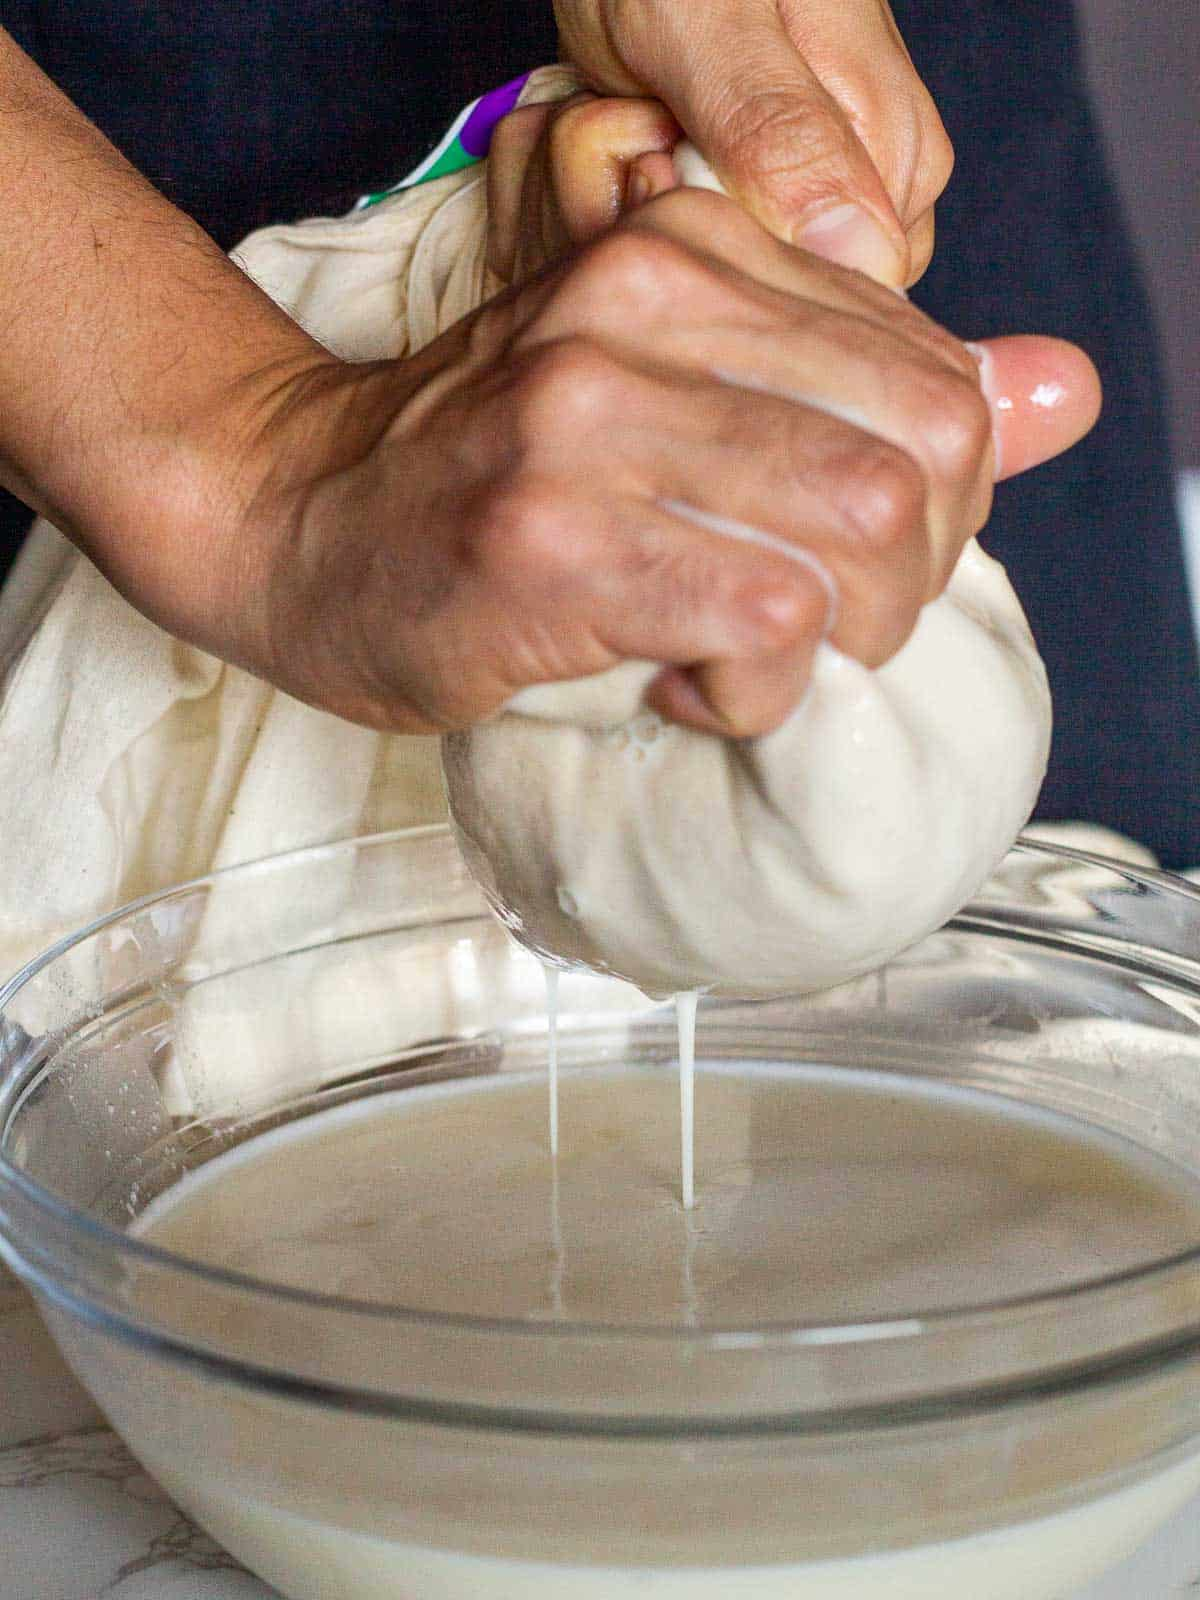 straining oat milk with hand